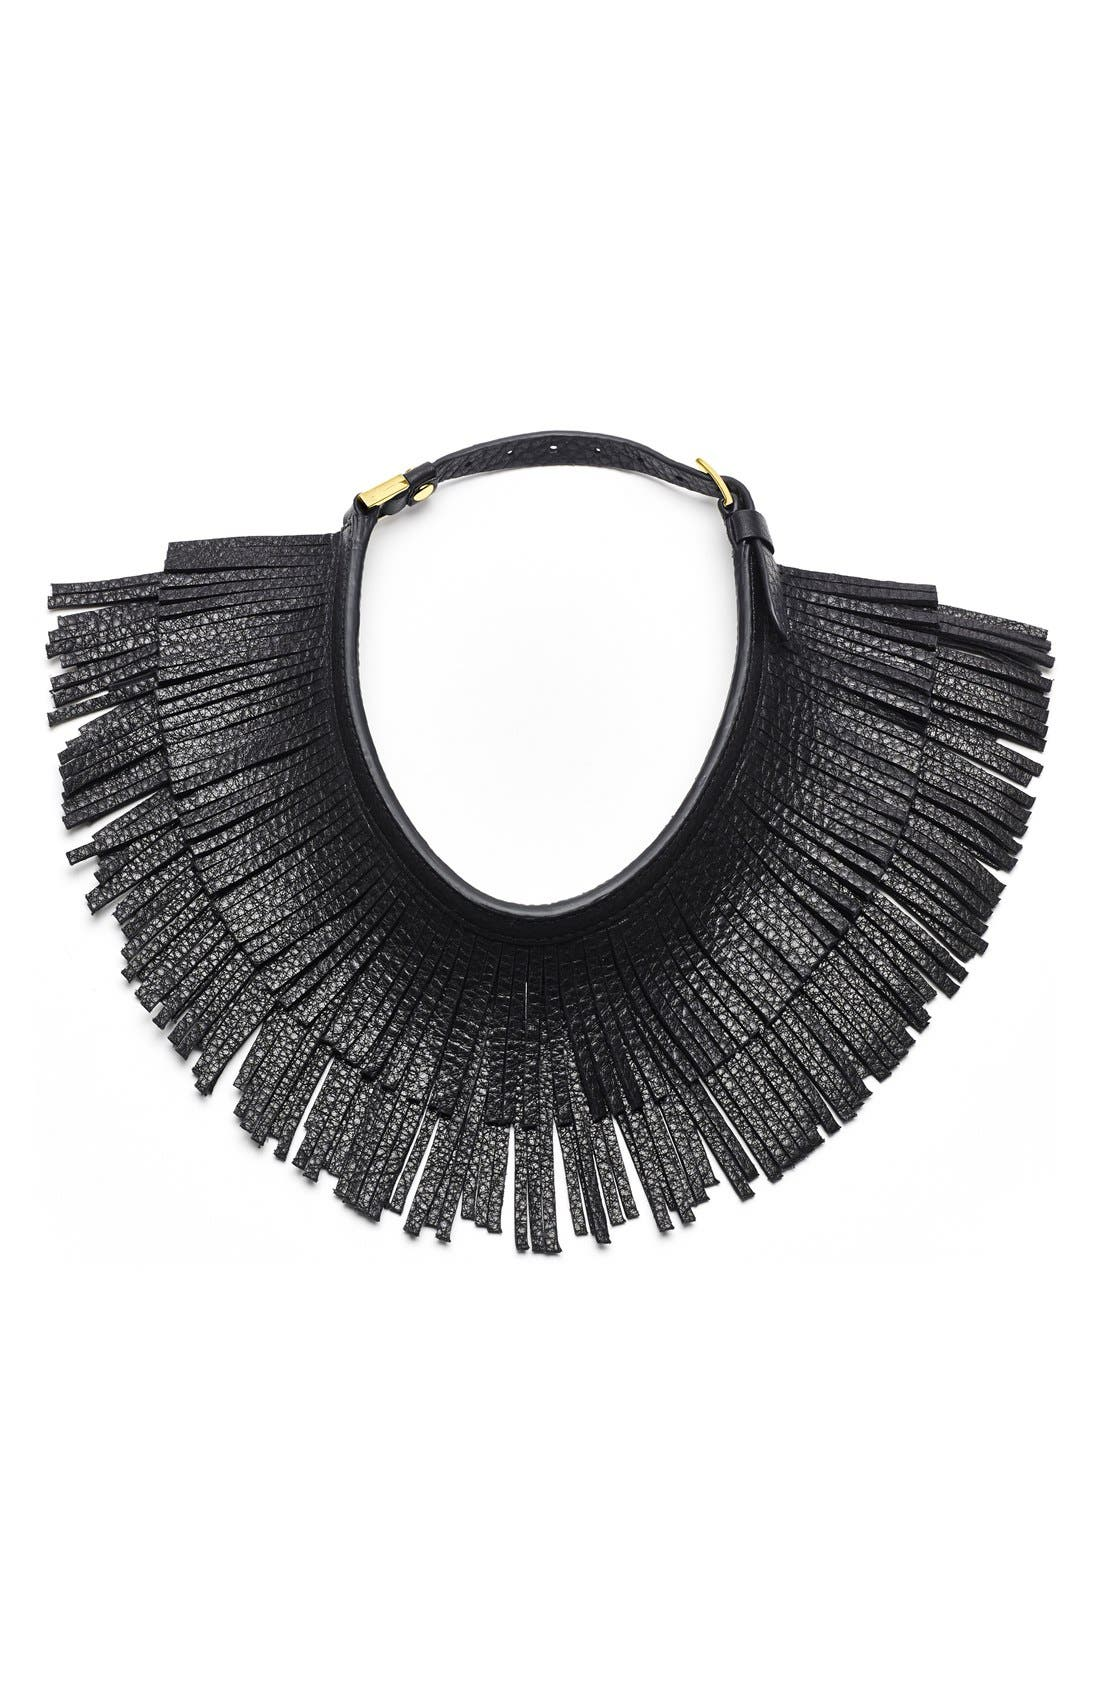 Alternate Image 1 Selected - Hayden-Harnett Leather Fringe Collar Necklace